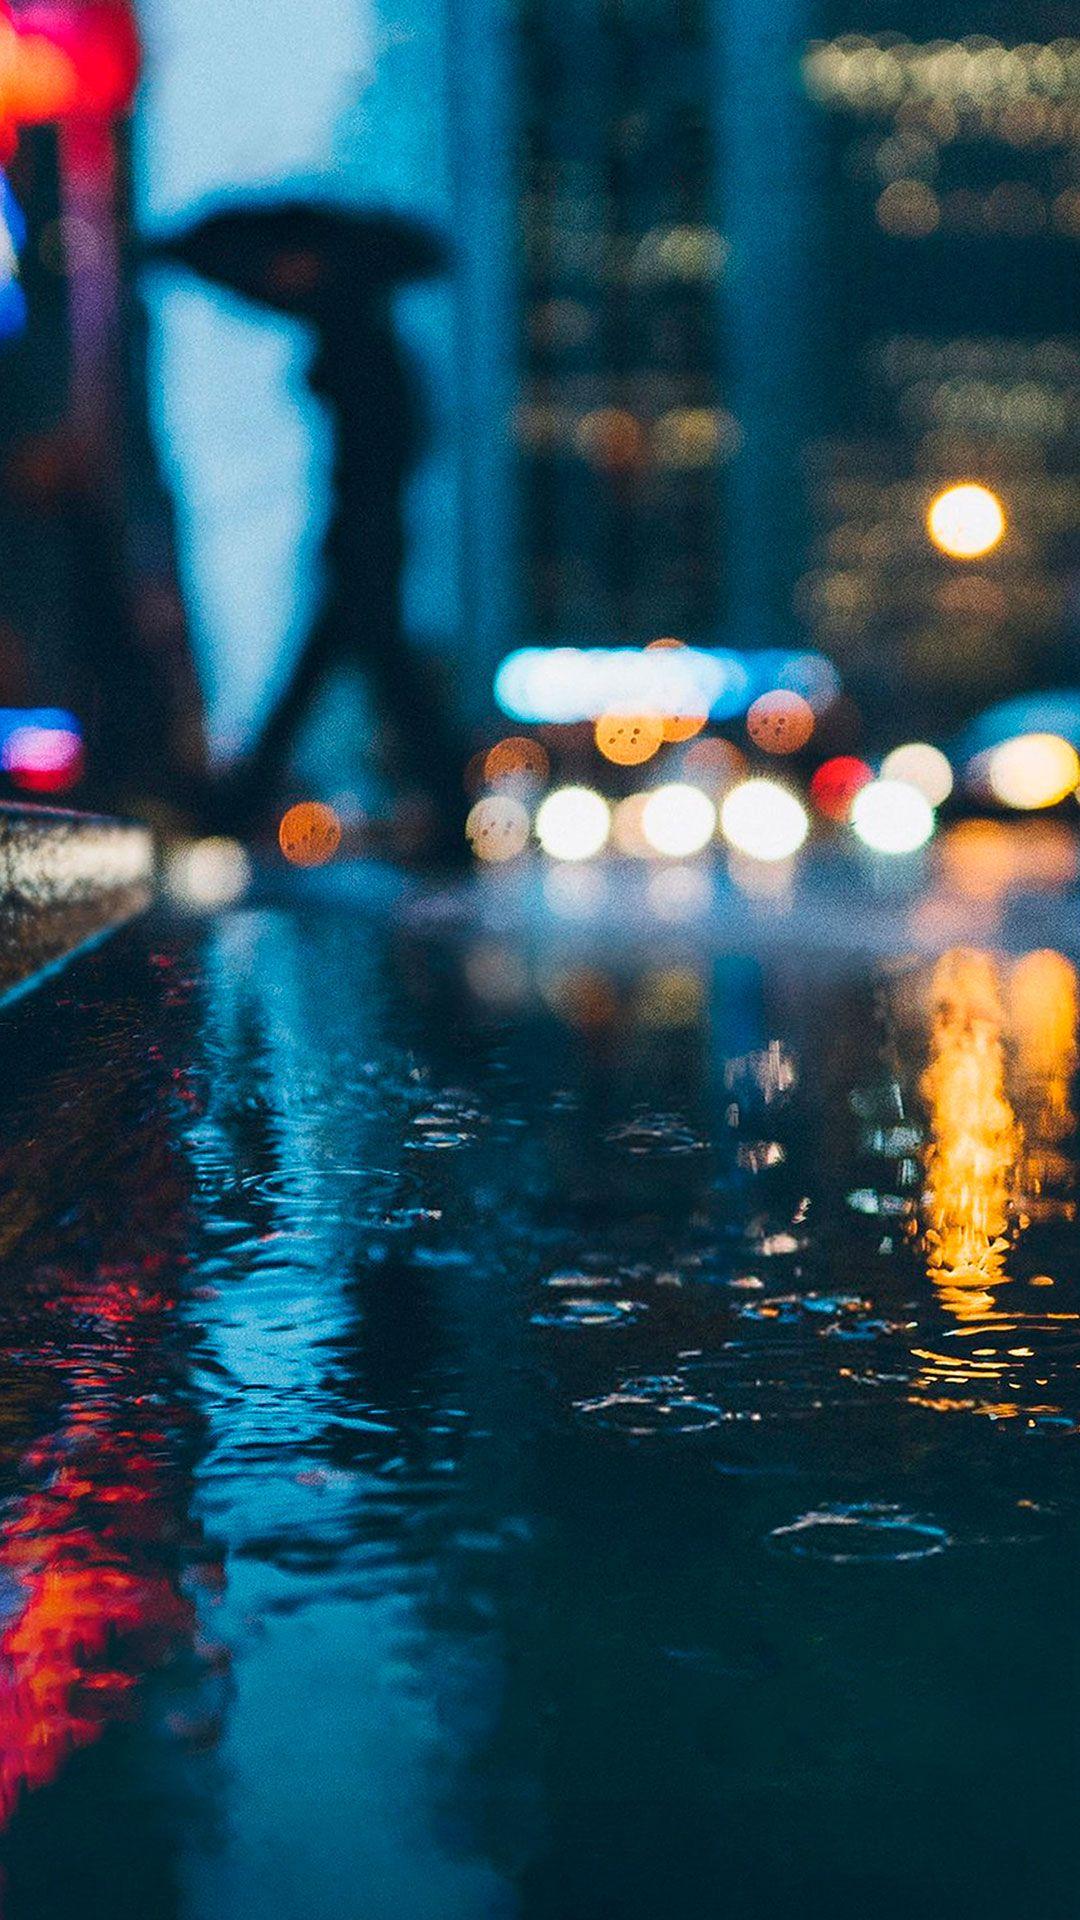 Rain Iphone Wallpaper